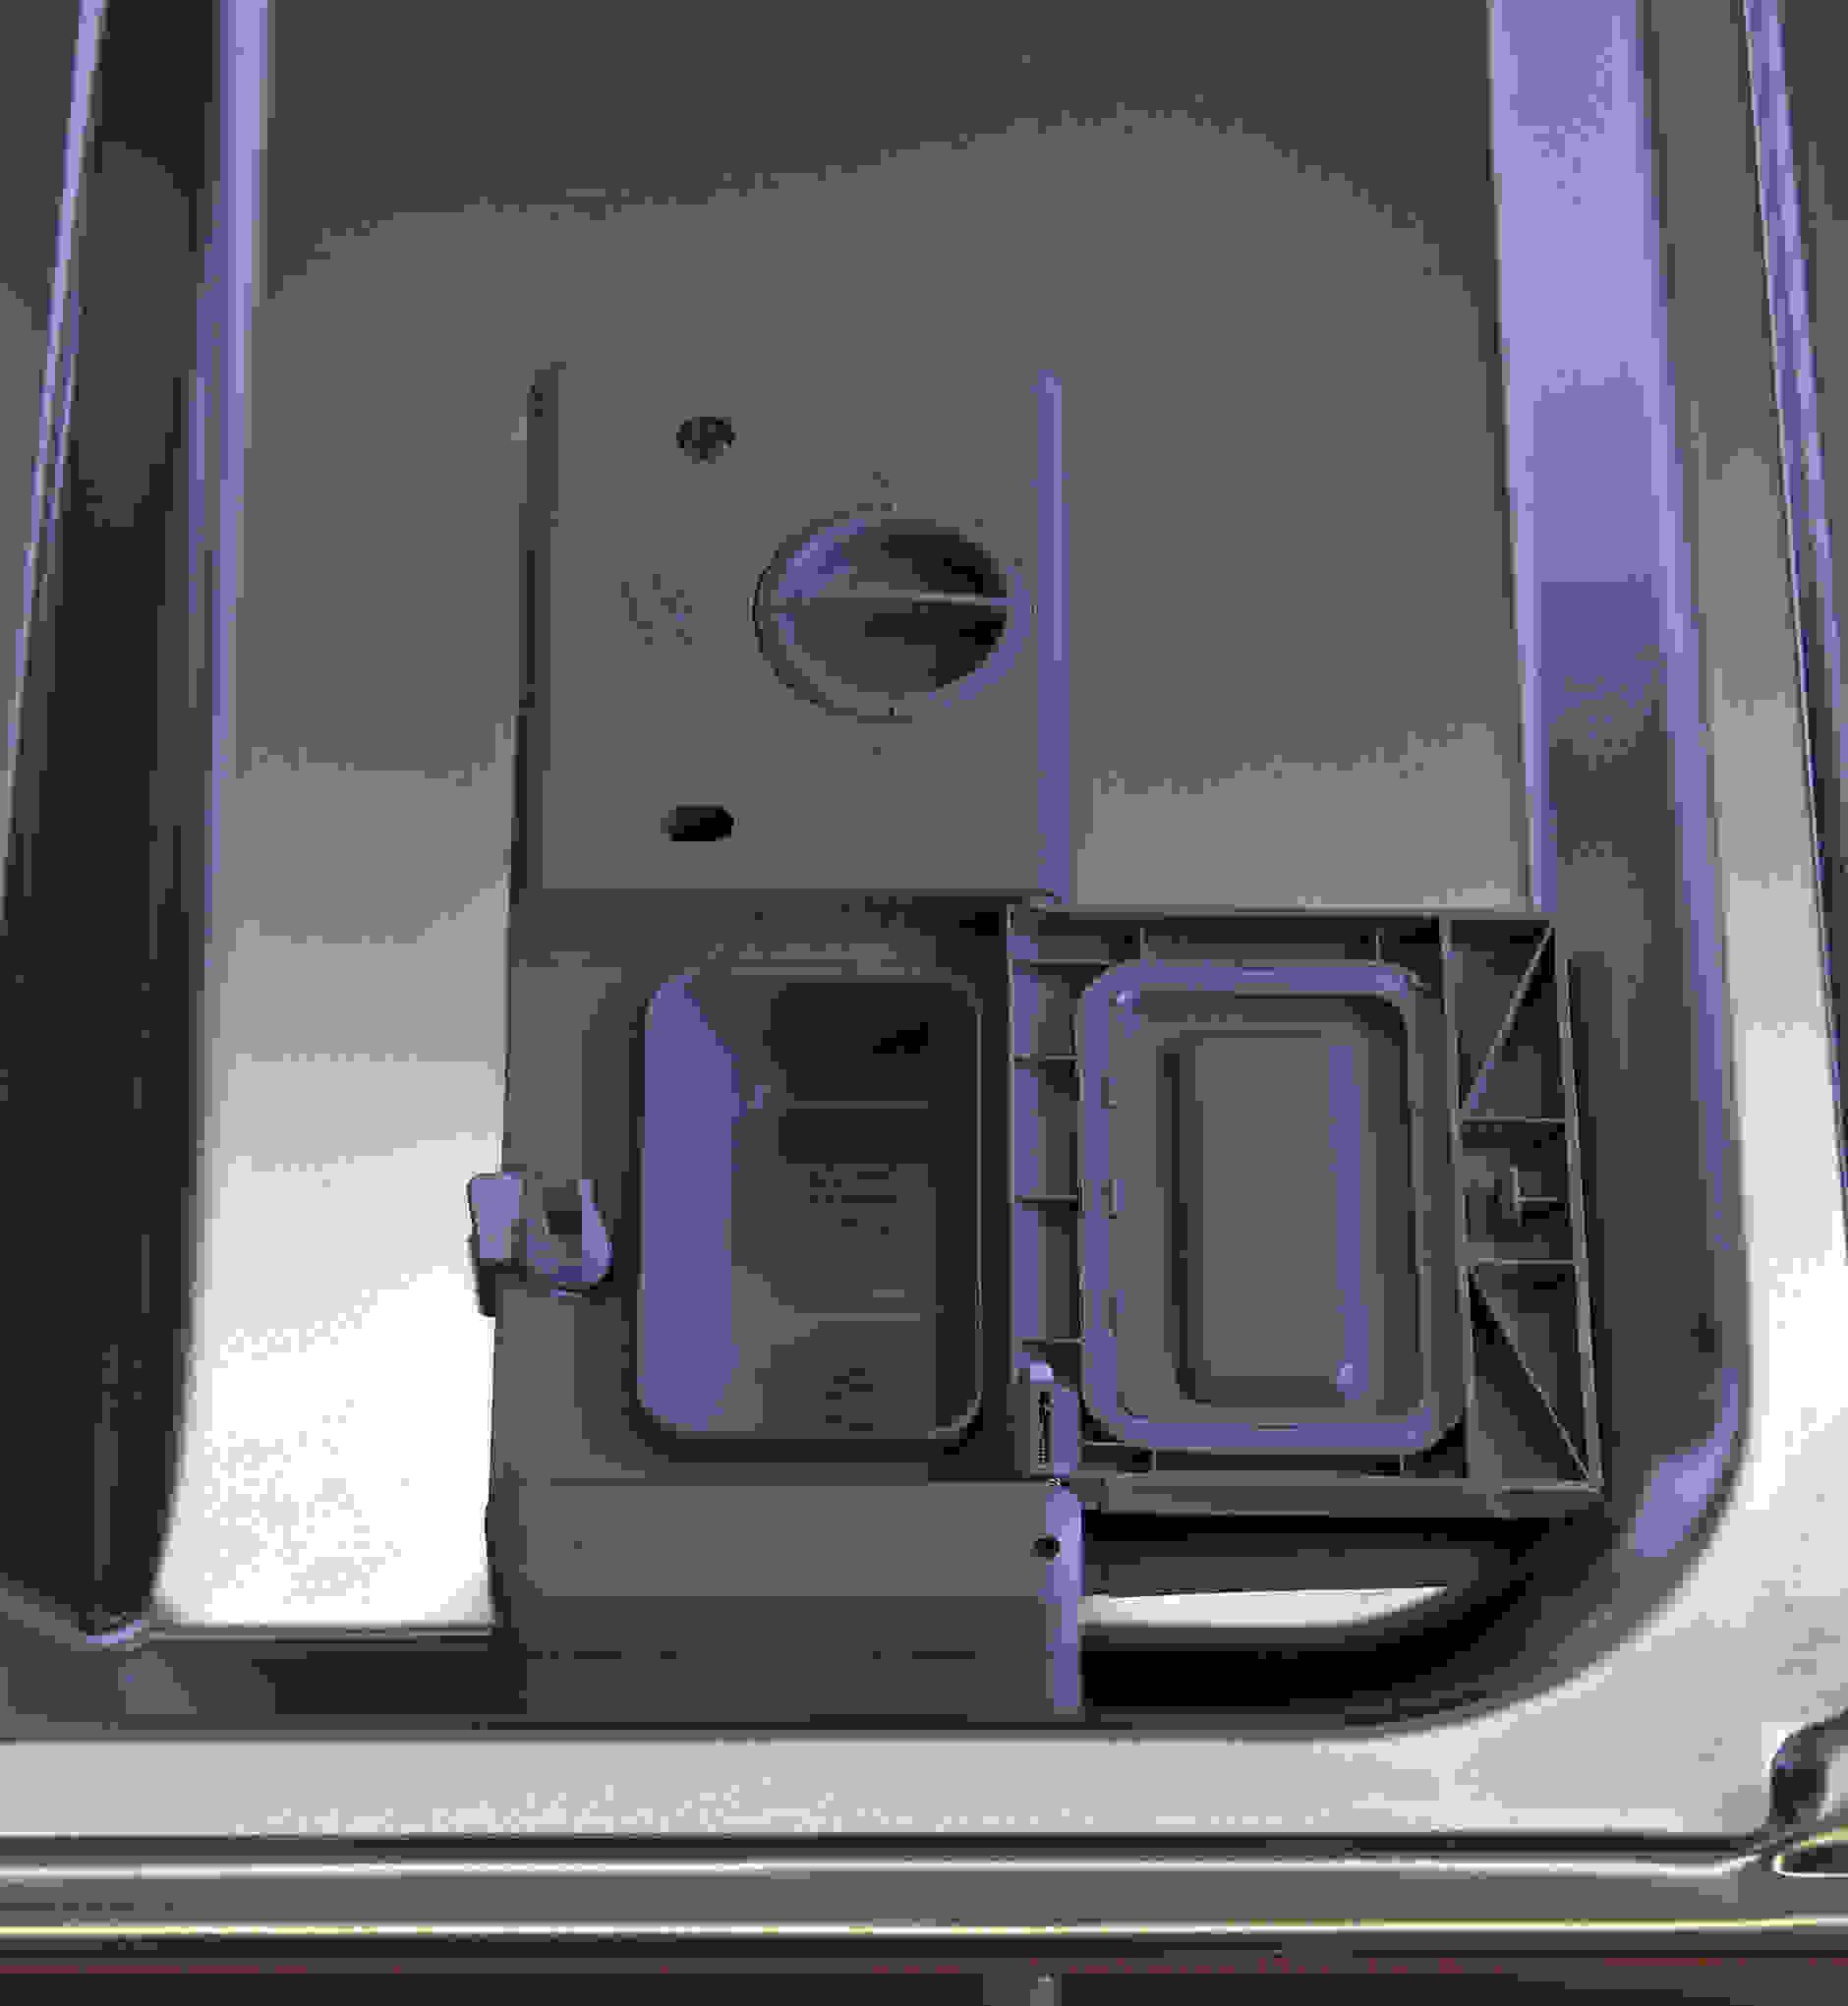 Samsung DW80F800UWS detergent and rinse aid dispenser